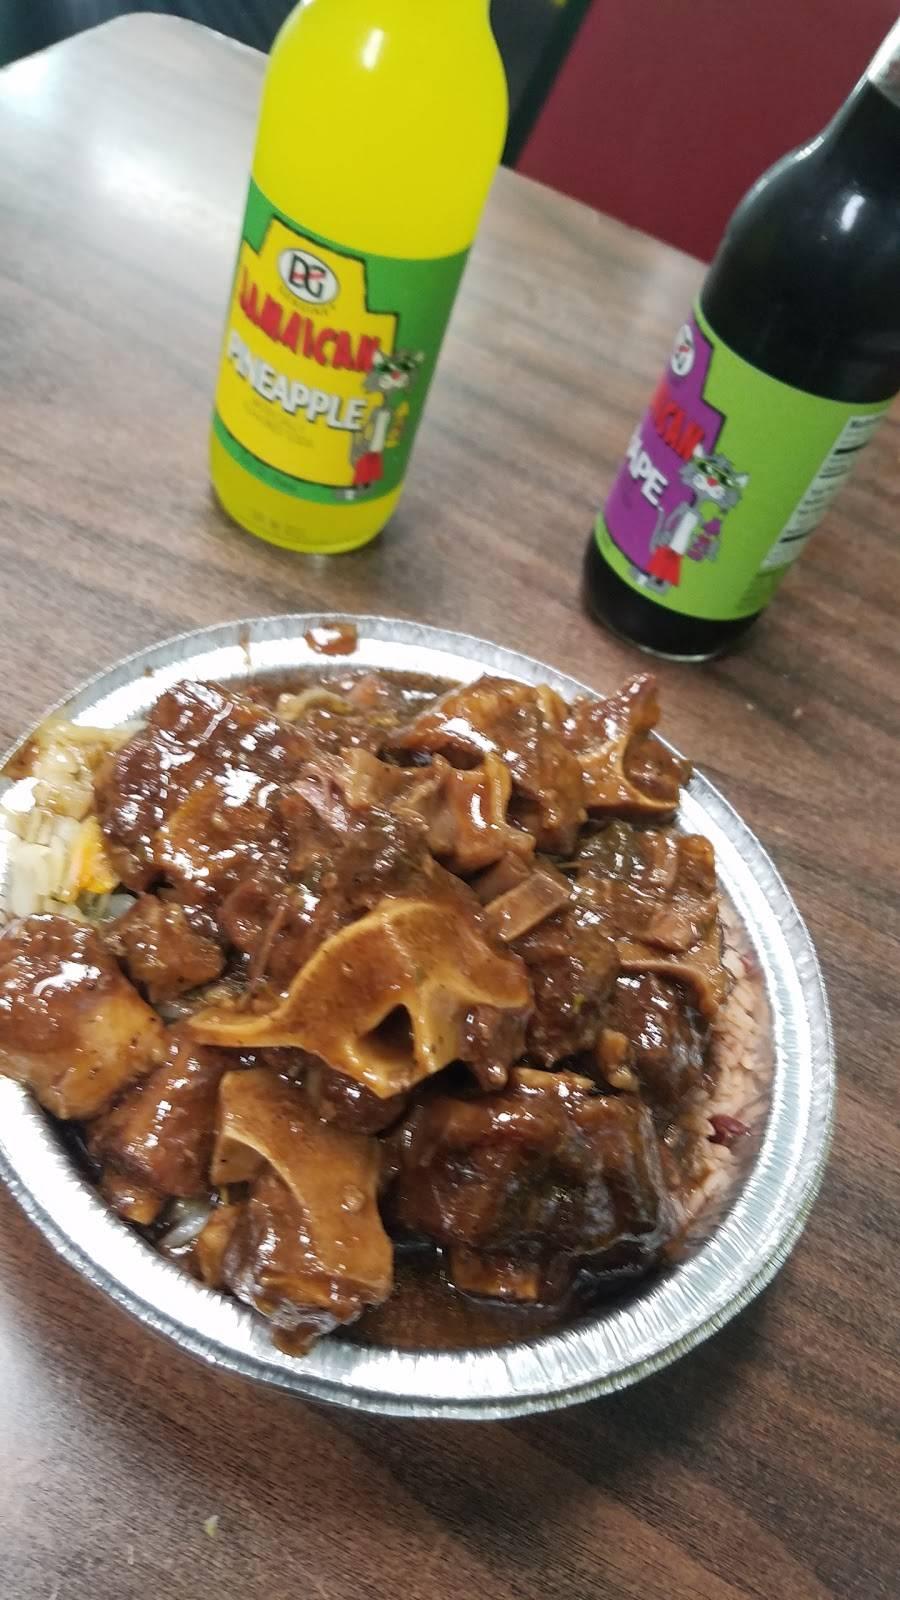 Corner Style | restaurant | 1195 Walton Ave, Bronx, NY 10452, USA | 7184108460 OR +1 718-410-8460